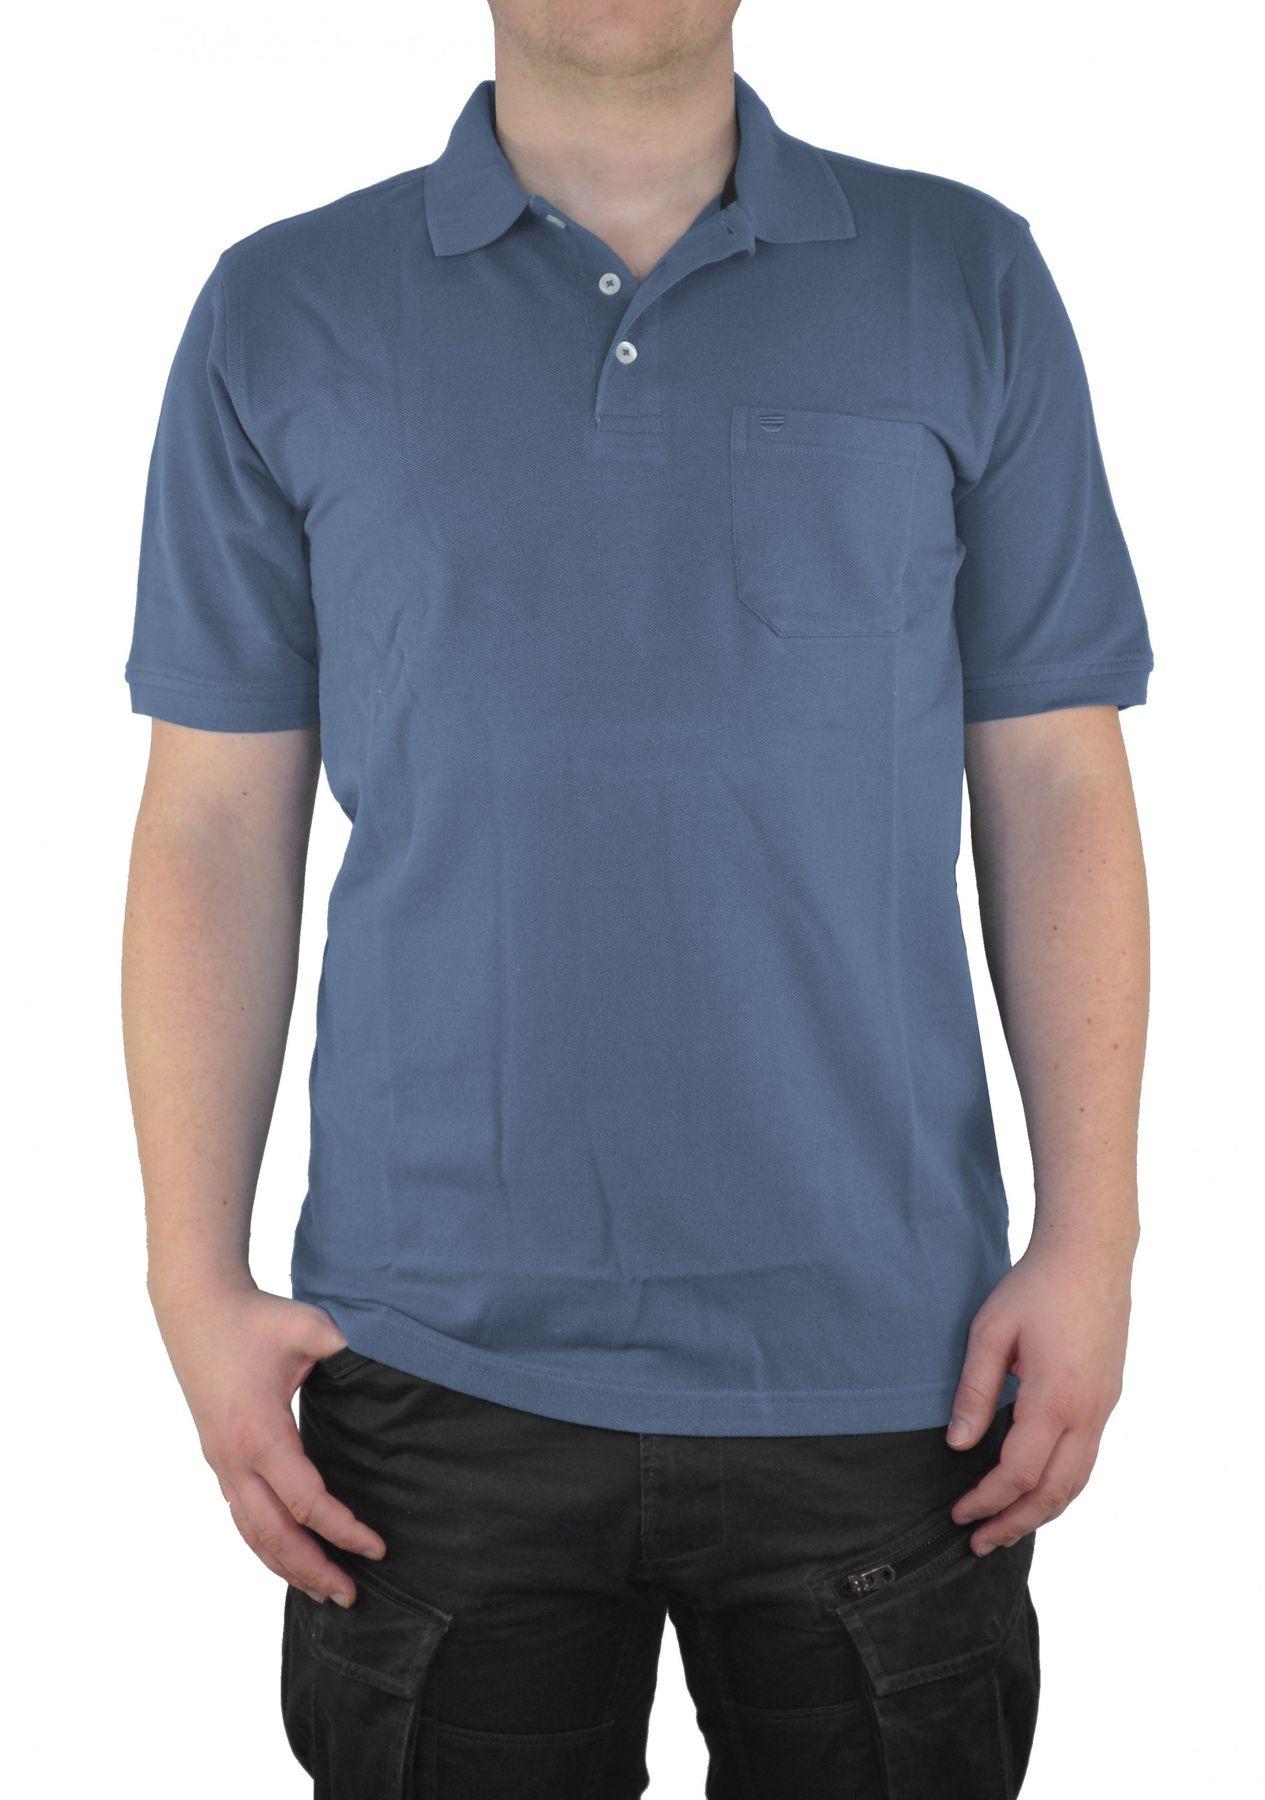 Redmond - Regular Fit - Herren Polo Shirt in verschiedenen Farben (900 A) – Bild 9